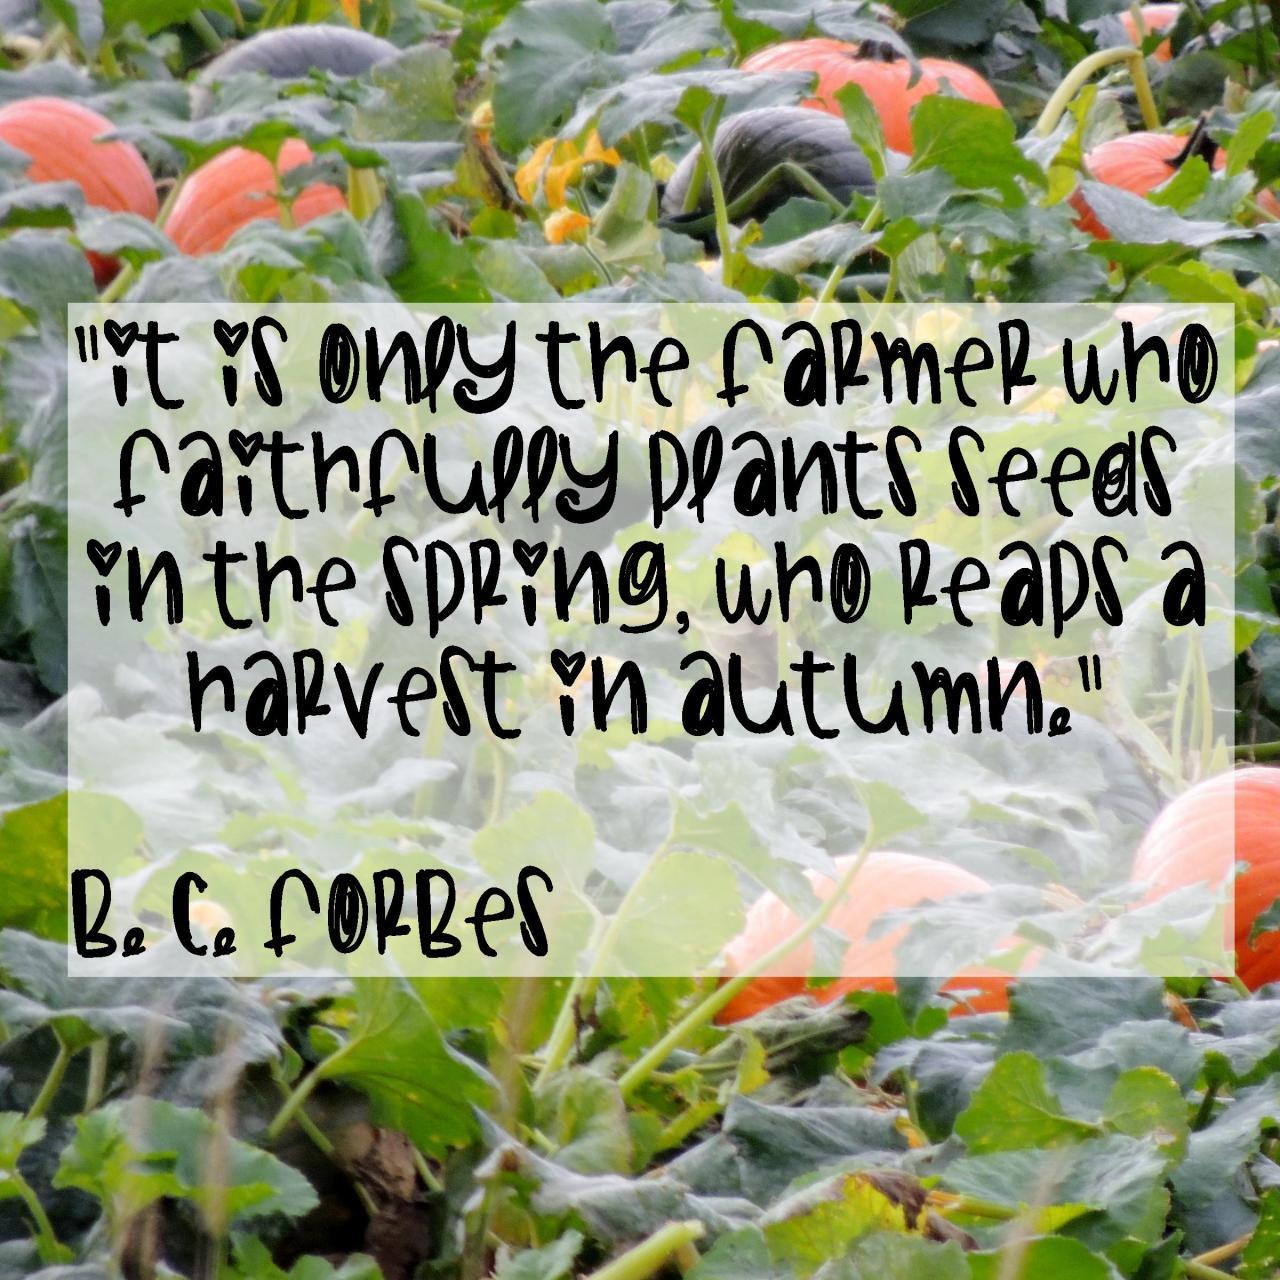 The farmer who plants gets #Pumpkins!